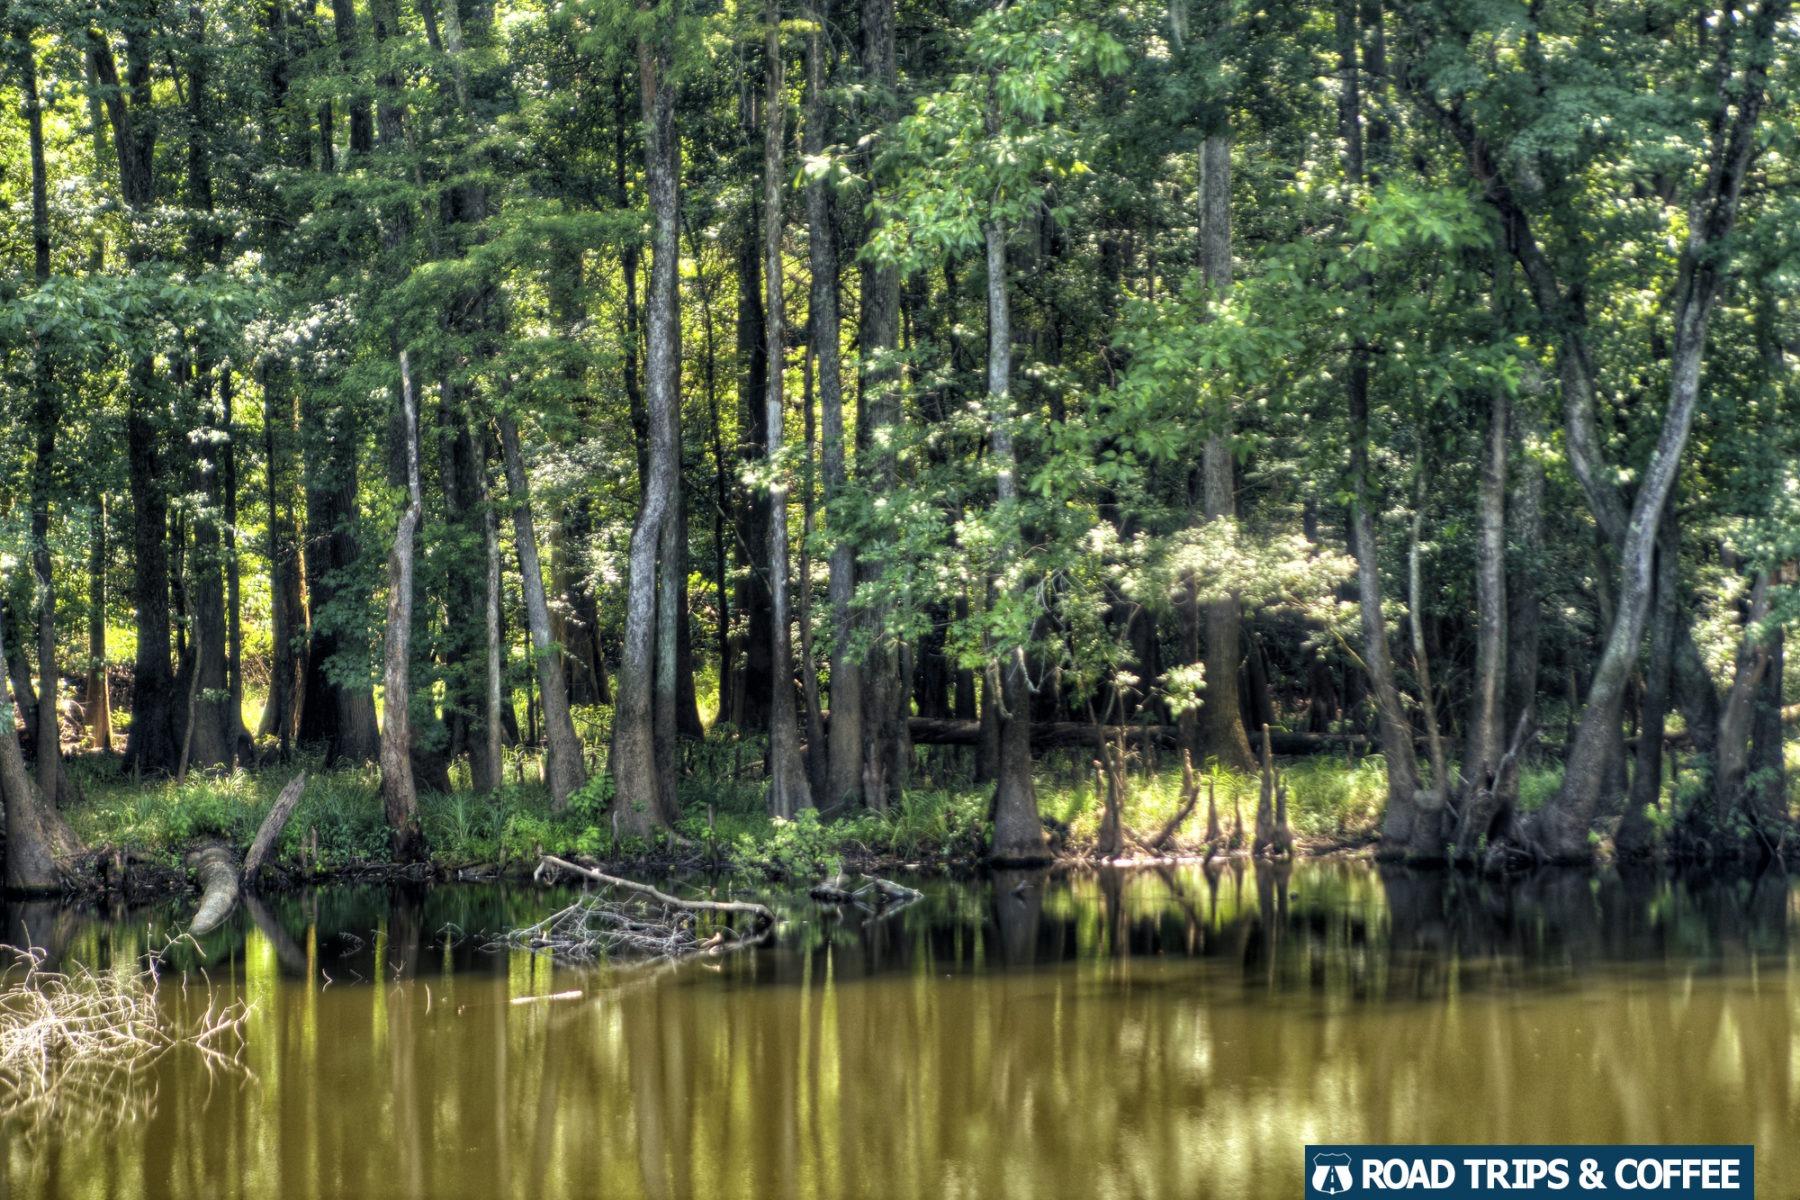 Forest surrounding Weston Lake at Congaree National Park in South Carolina.